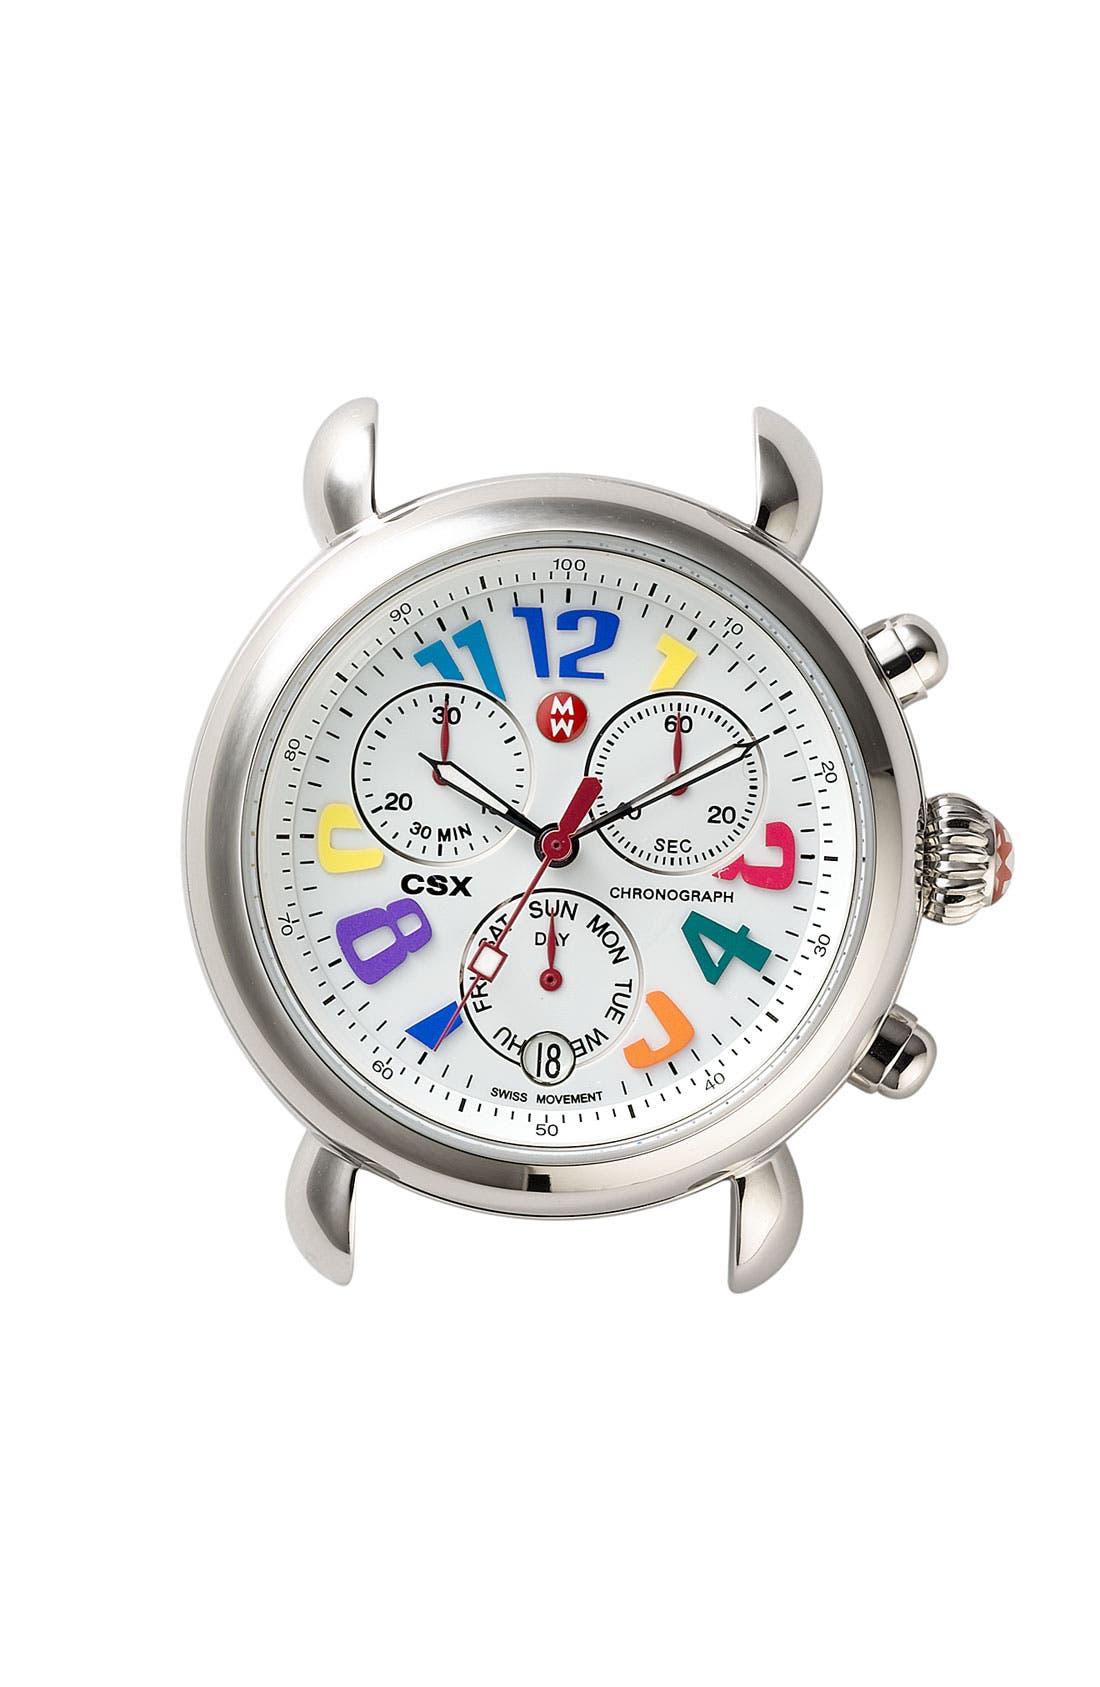 Main Image - MICHELE 'CSX Carousel' Watch Case, 36